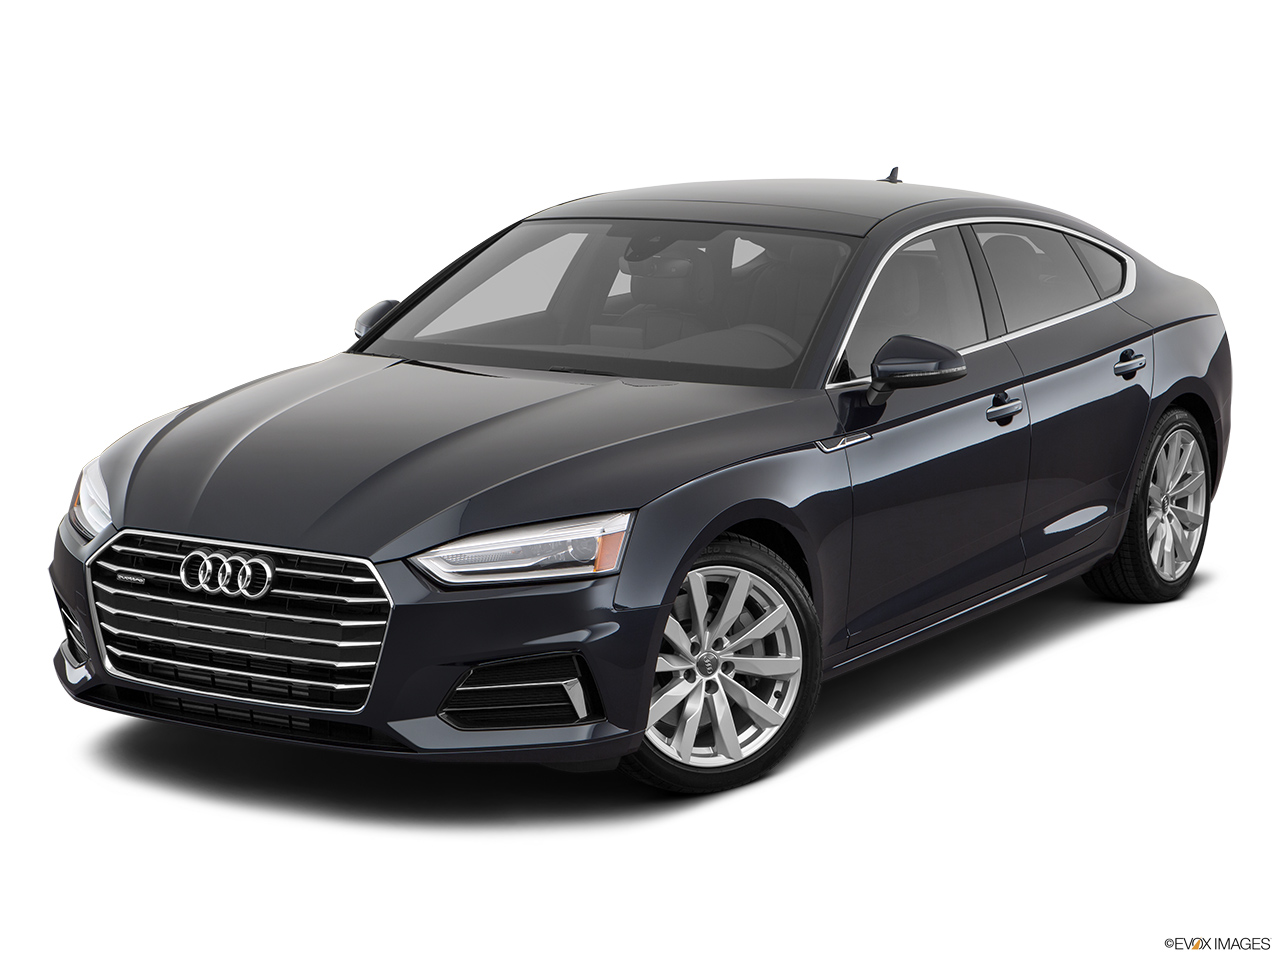 Audi A5 Sportback 2018 18L 170 HP In Egypt New Car